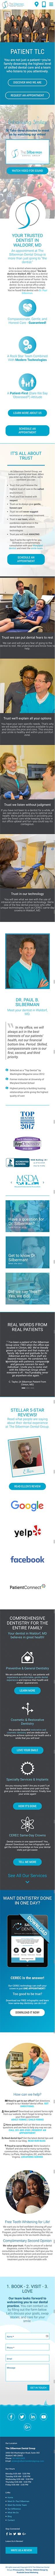 Silberman Dental Group new responsive dental website -mobile version